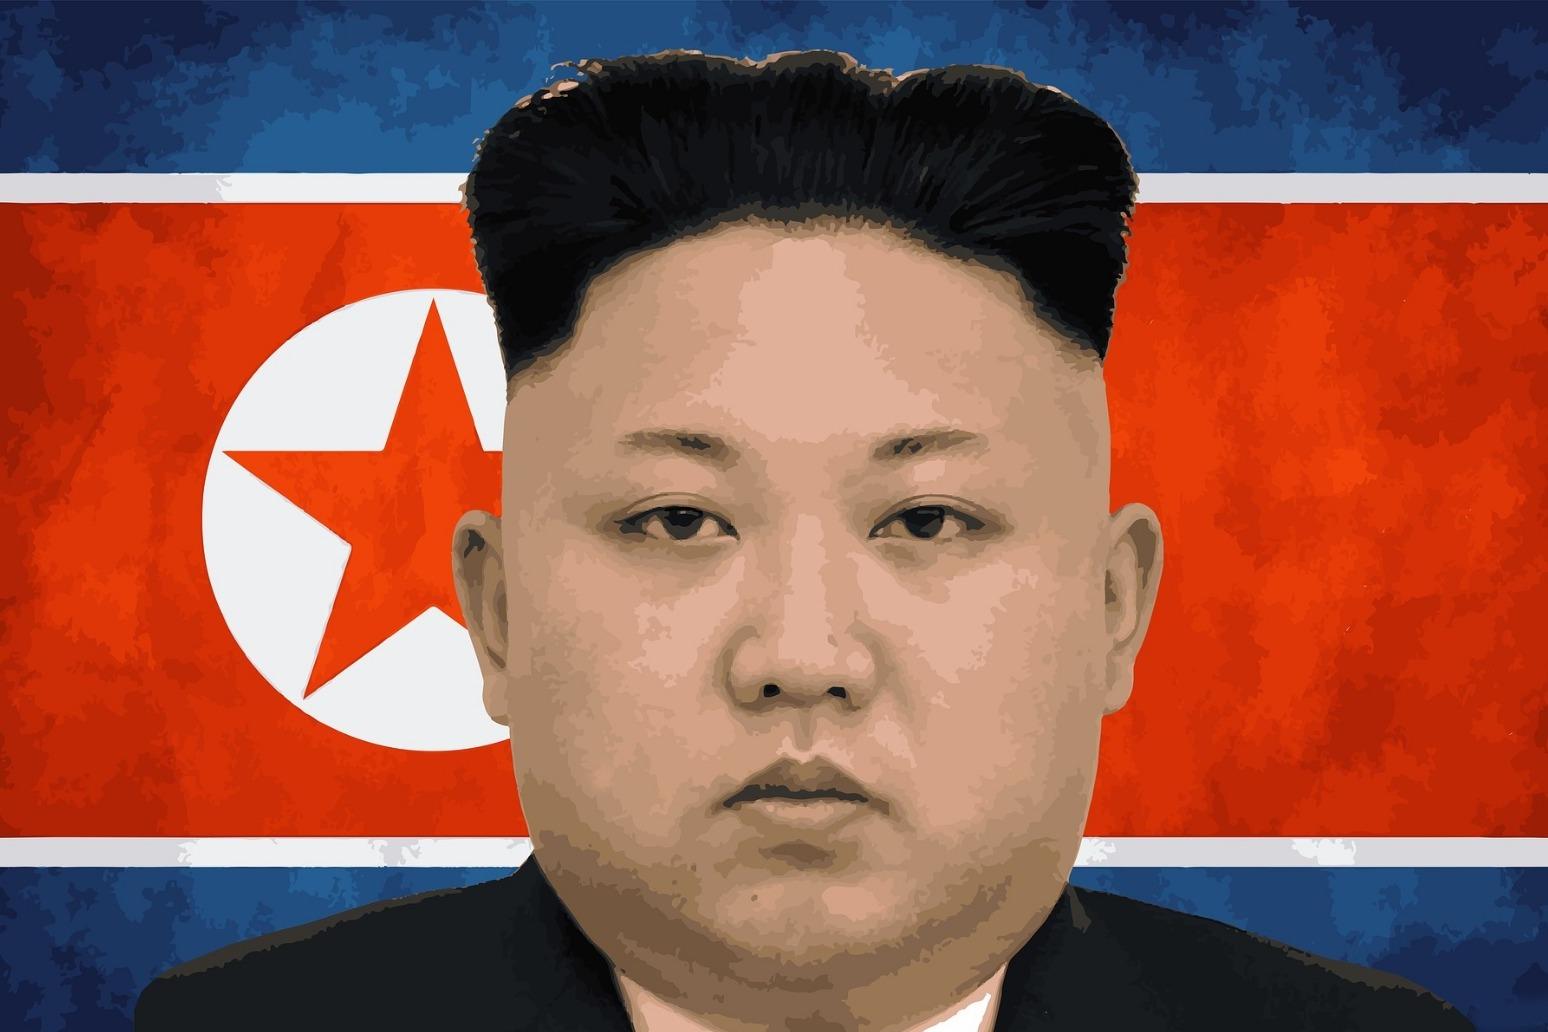 Vietnam announces visit by N.Korean leader Kim, ahead of summit with Trump